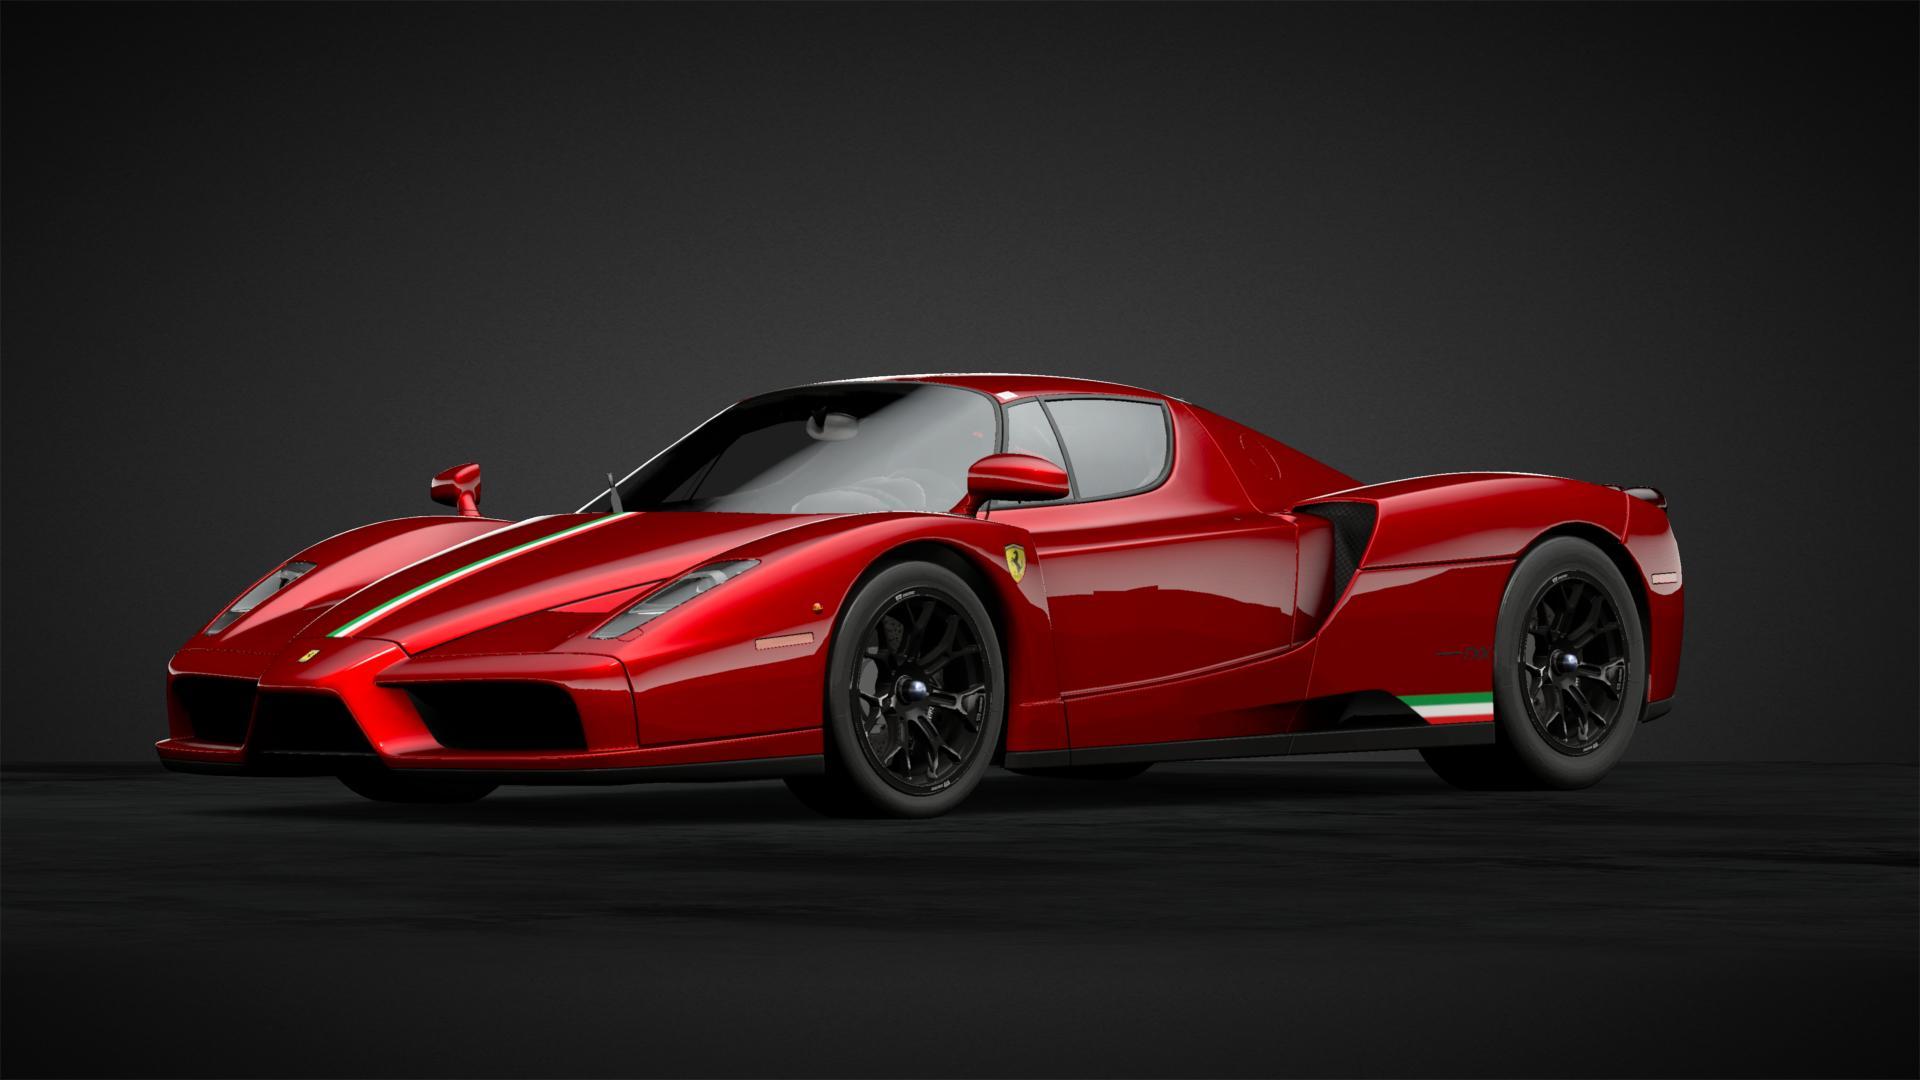 2021 Enzo Ferrari Car - Car Wallpaper